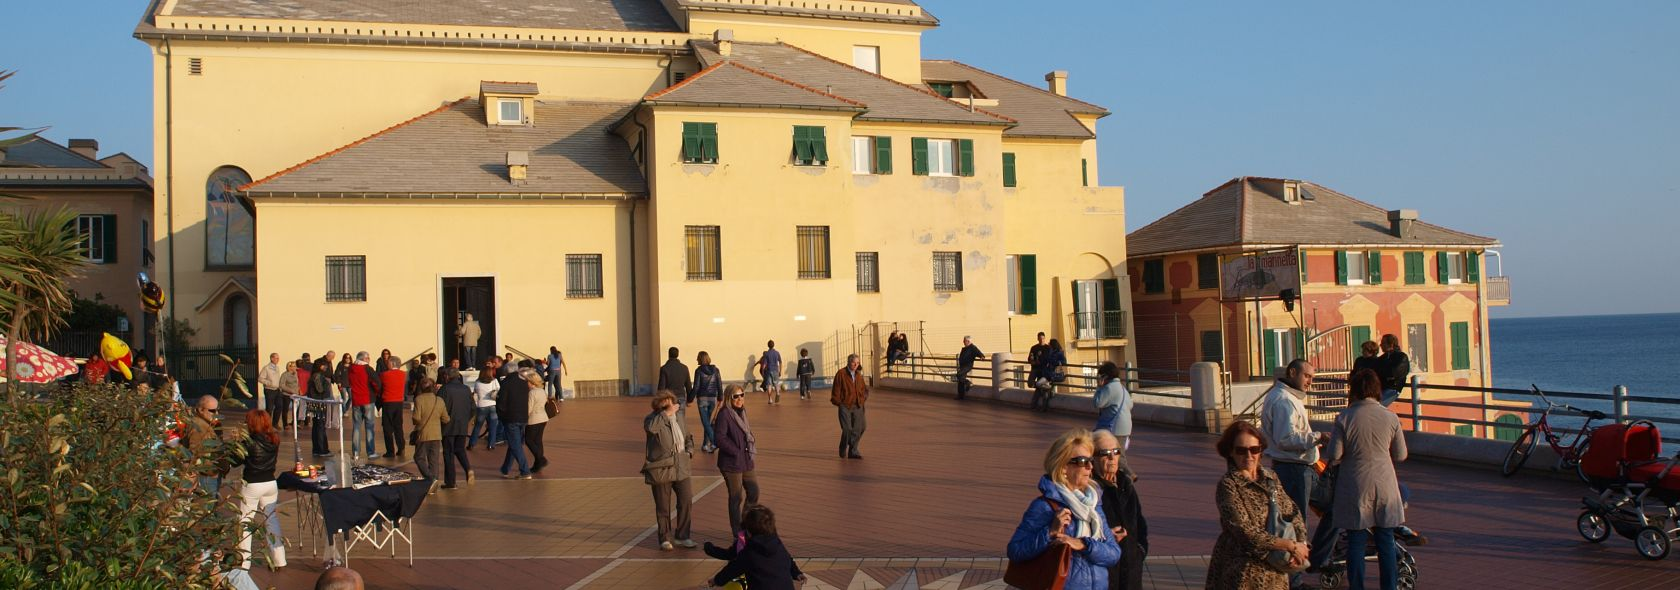 Corso Italia - Chiesa S. Antonio